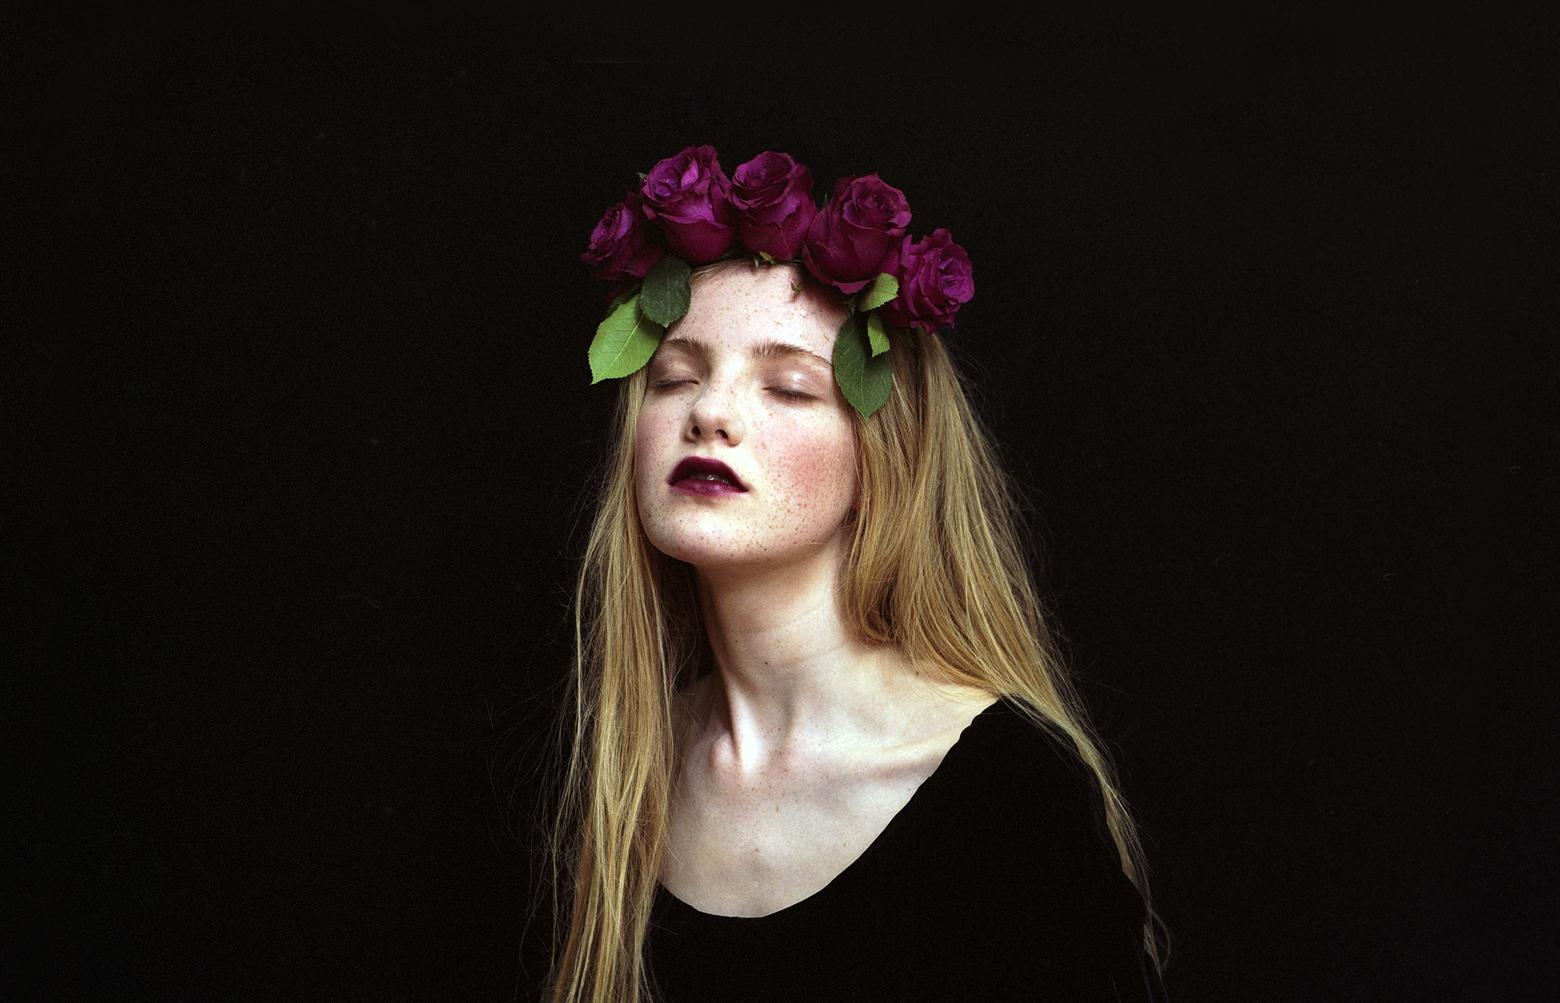 AND-Studio-TheMalevolentEye-RoseGirl